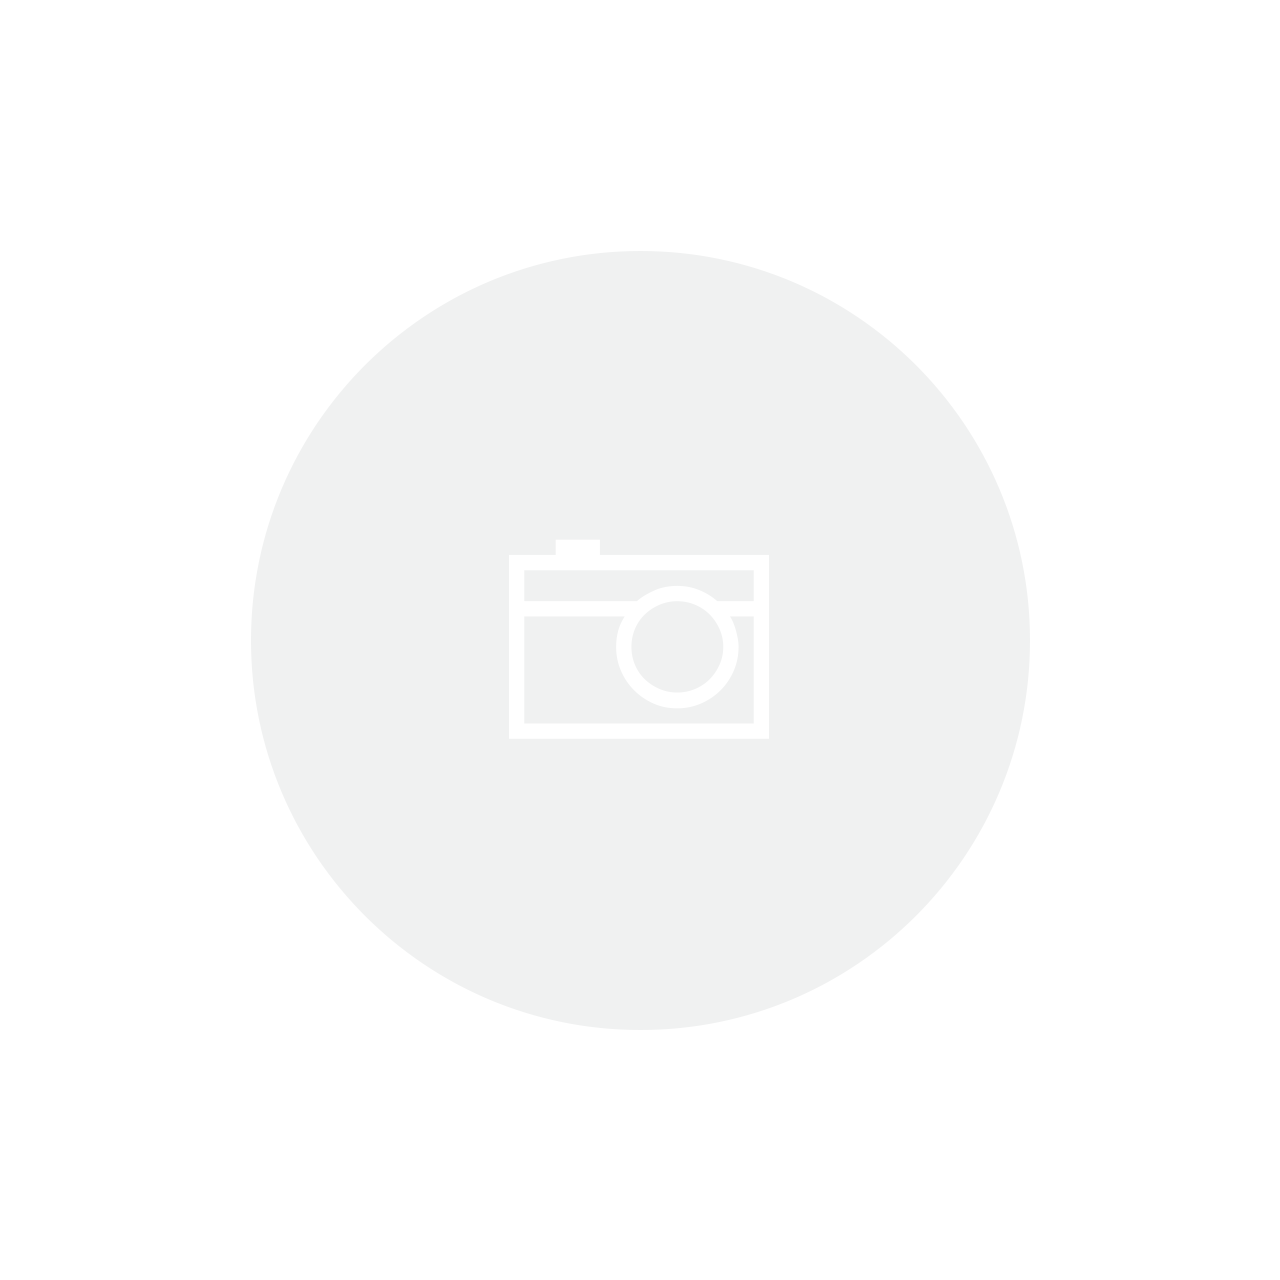 Fôrma para Bolo Antiaderente 24 cm Brasil Tramontina